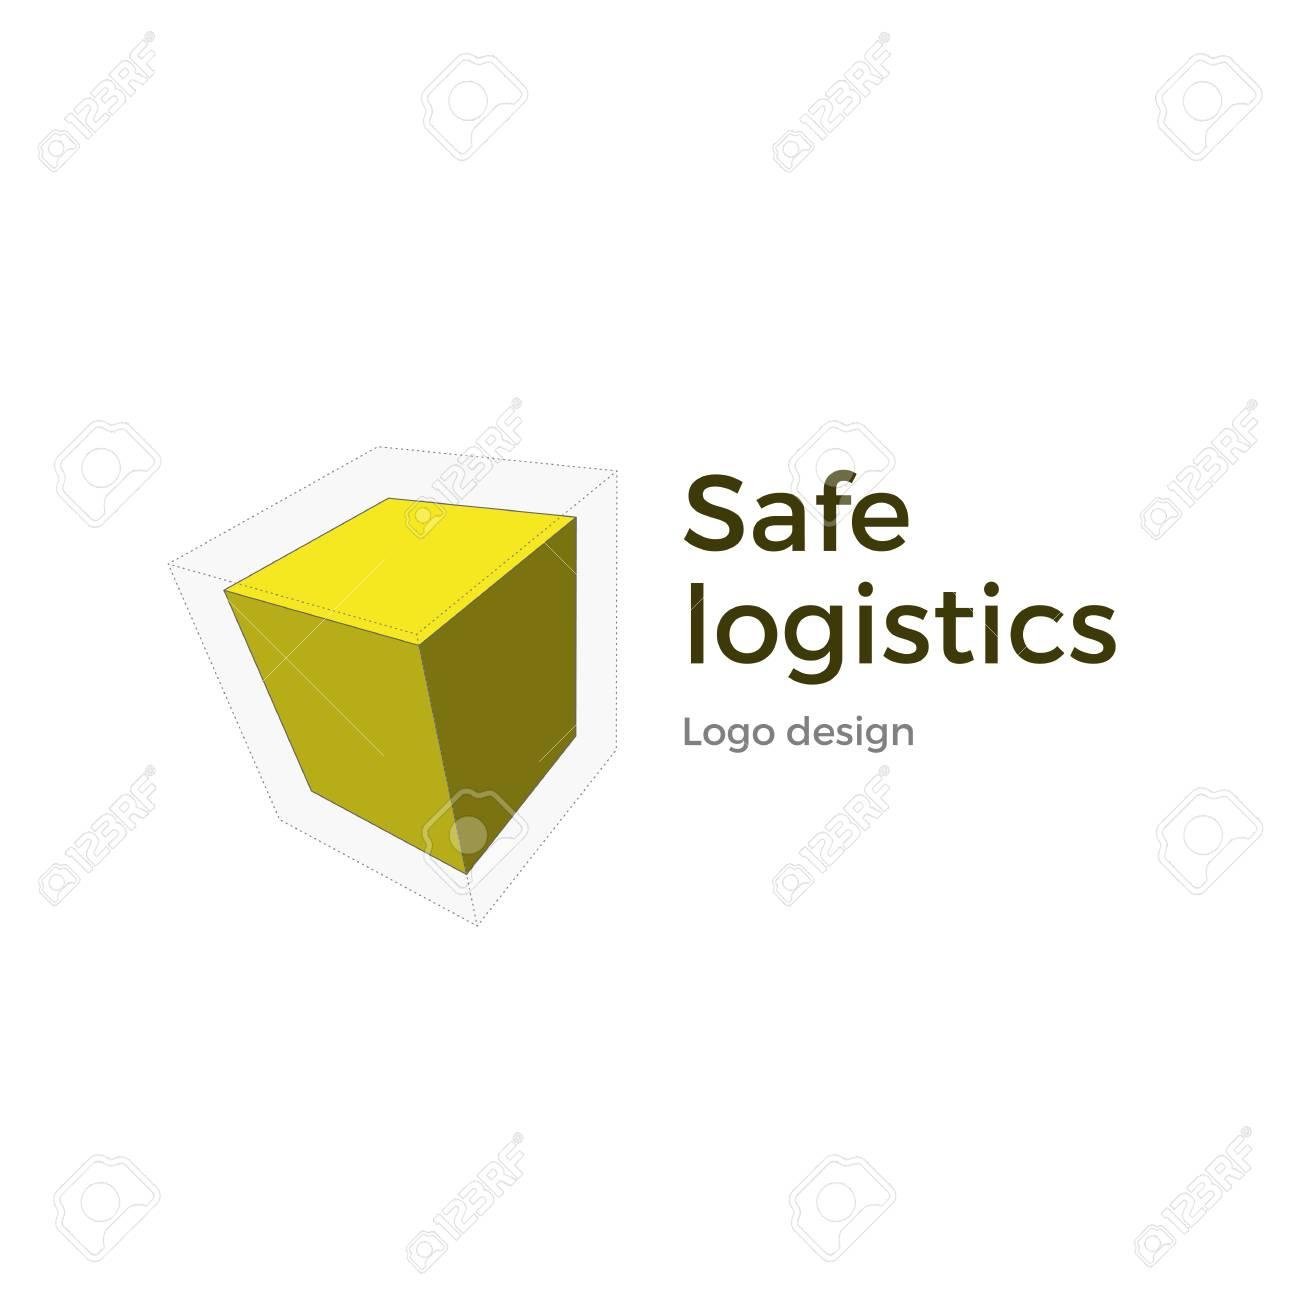 Vector logo design  Isometric cube design concept for logistics